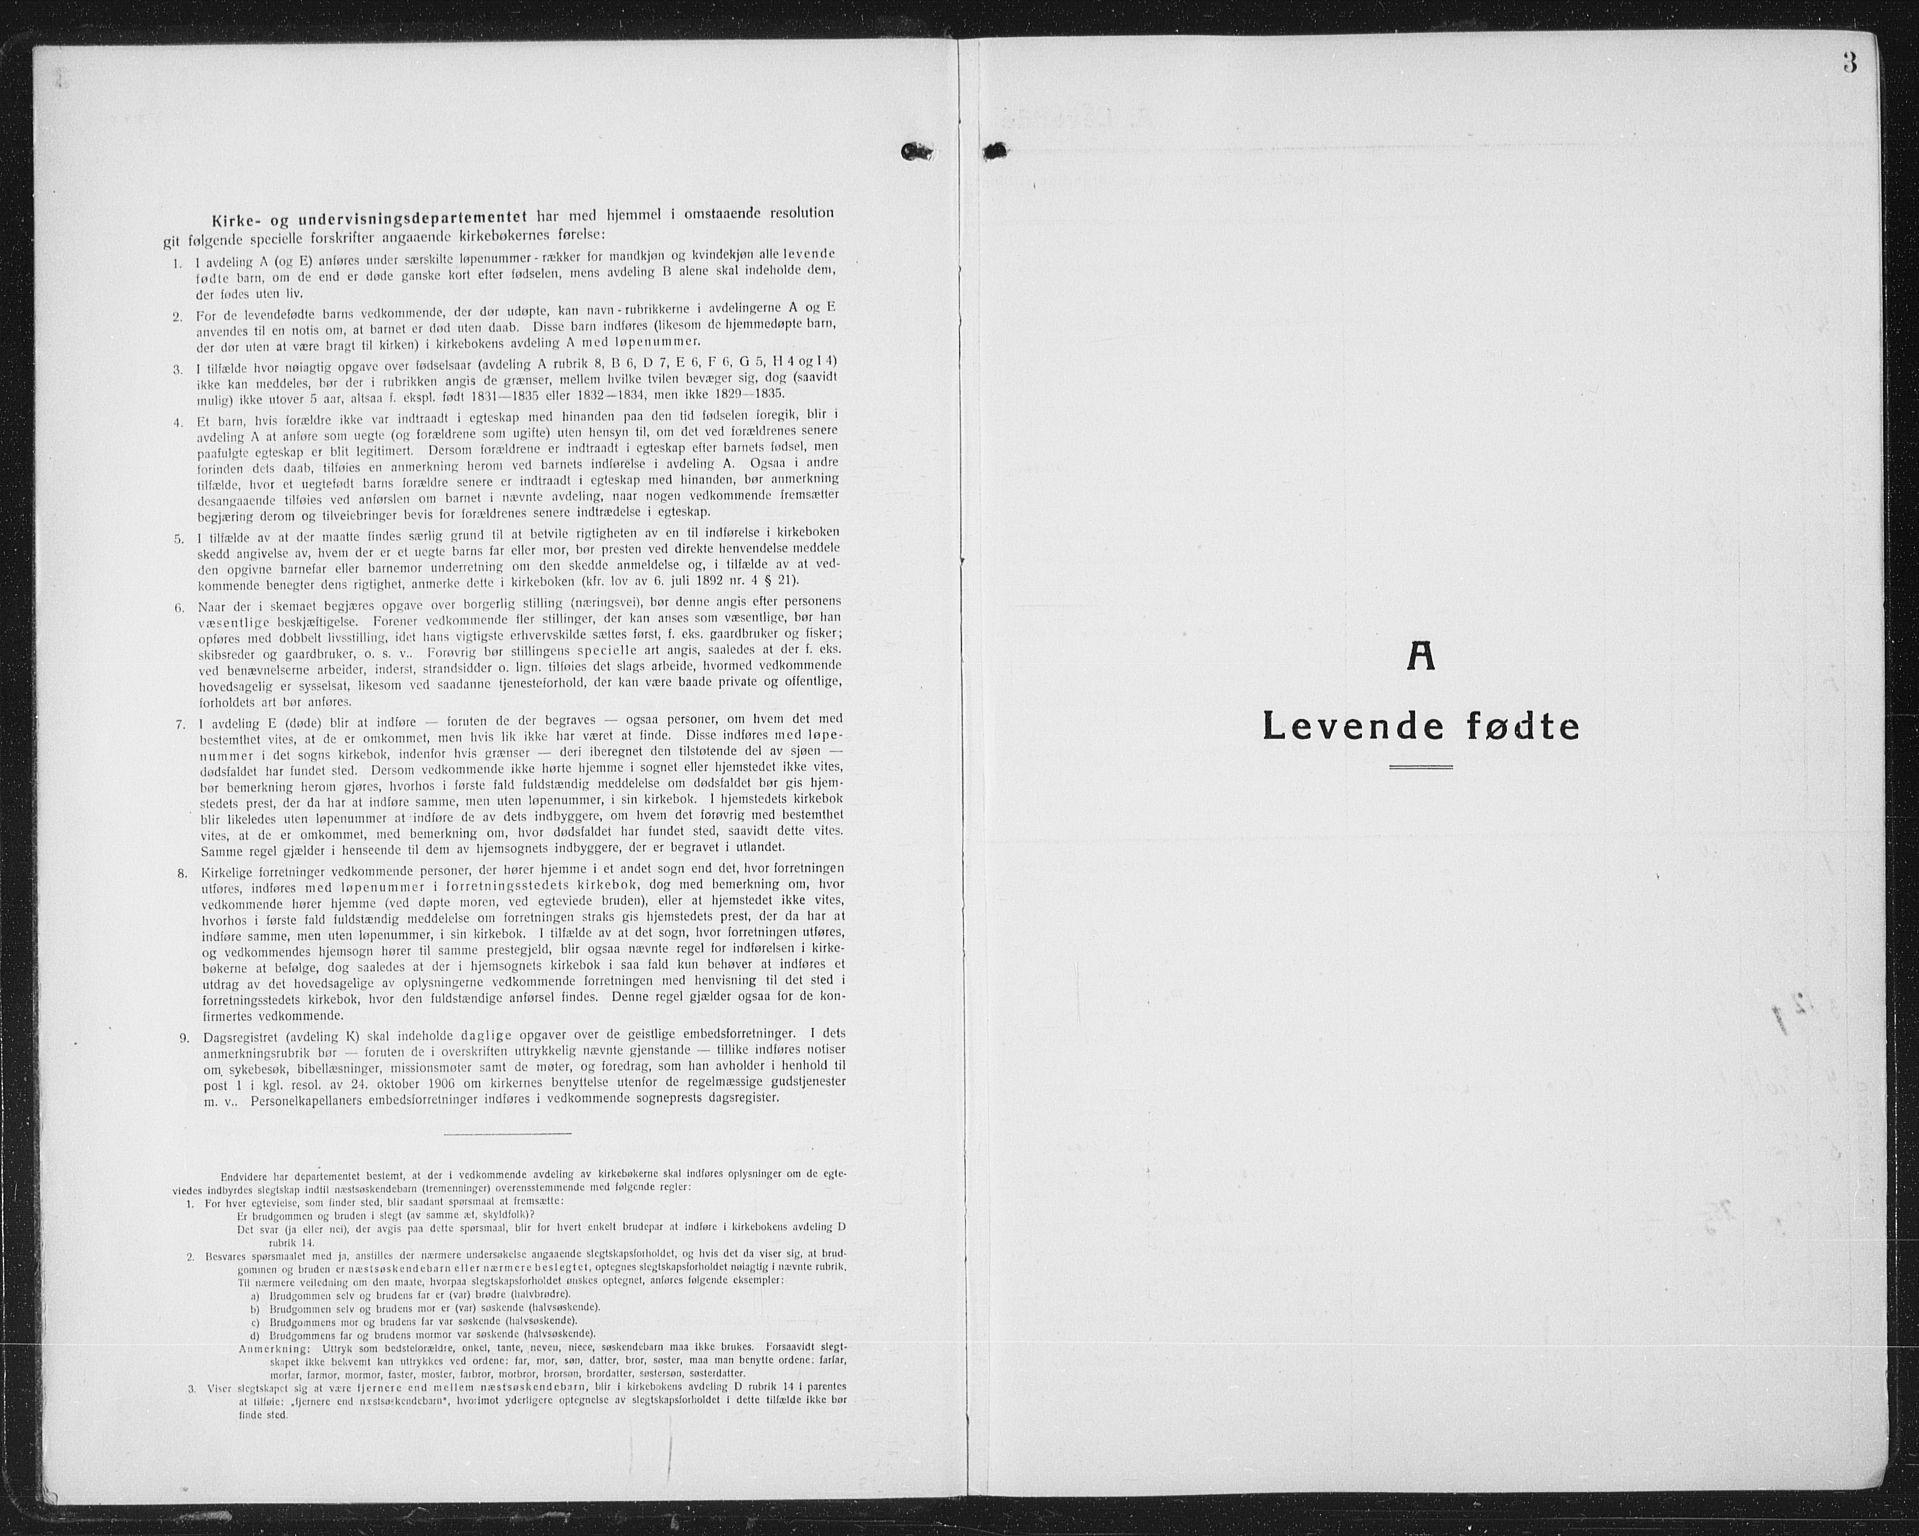 SAT, Ministerialprotokoller, klokkerbøker og fødselsregistre - Nordland, 804/L0089: Klokkerbok nr. 804C02, 1918-1935, s. 3